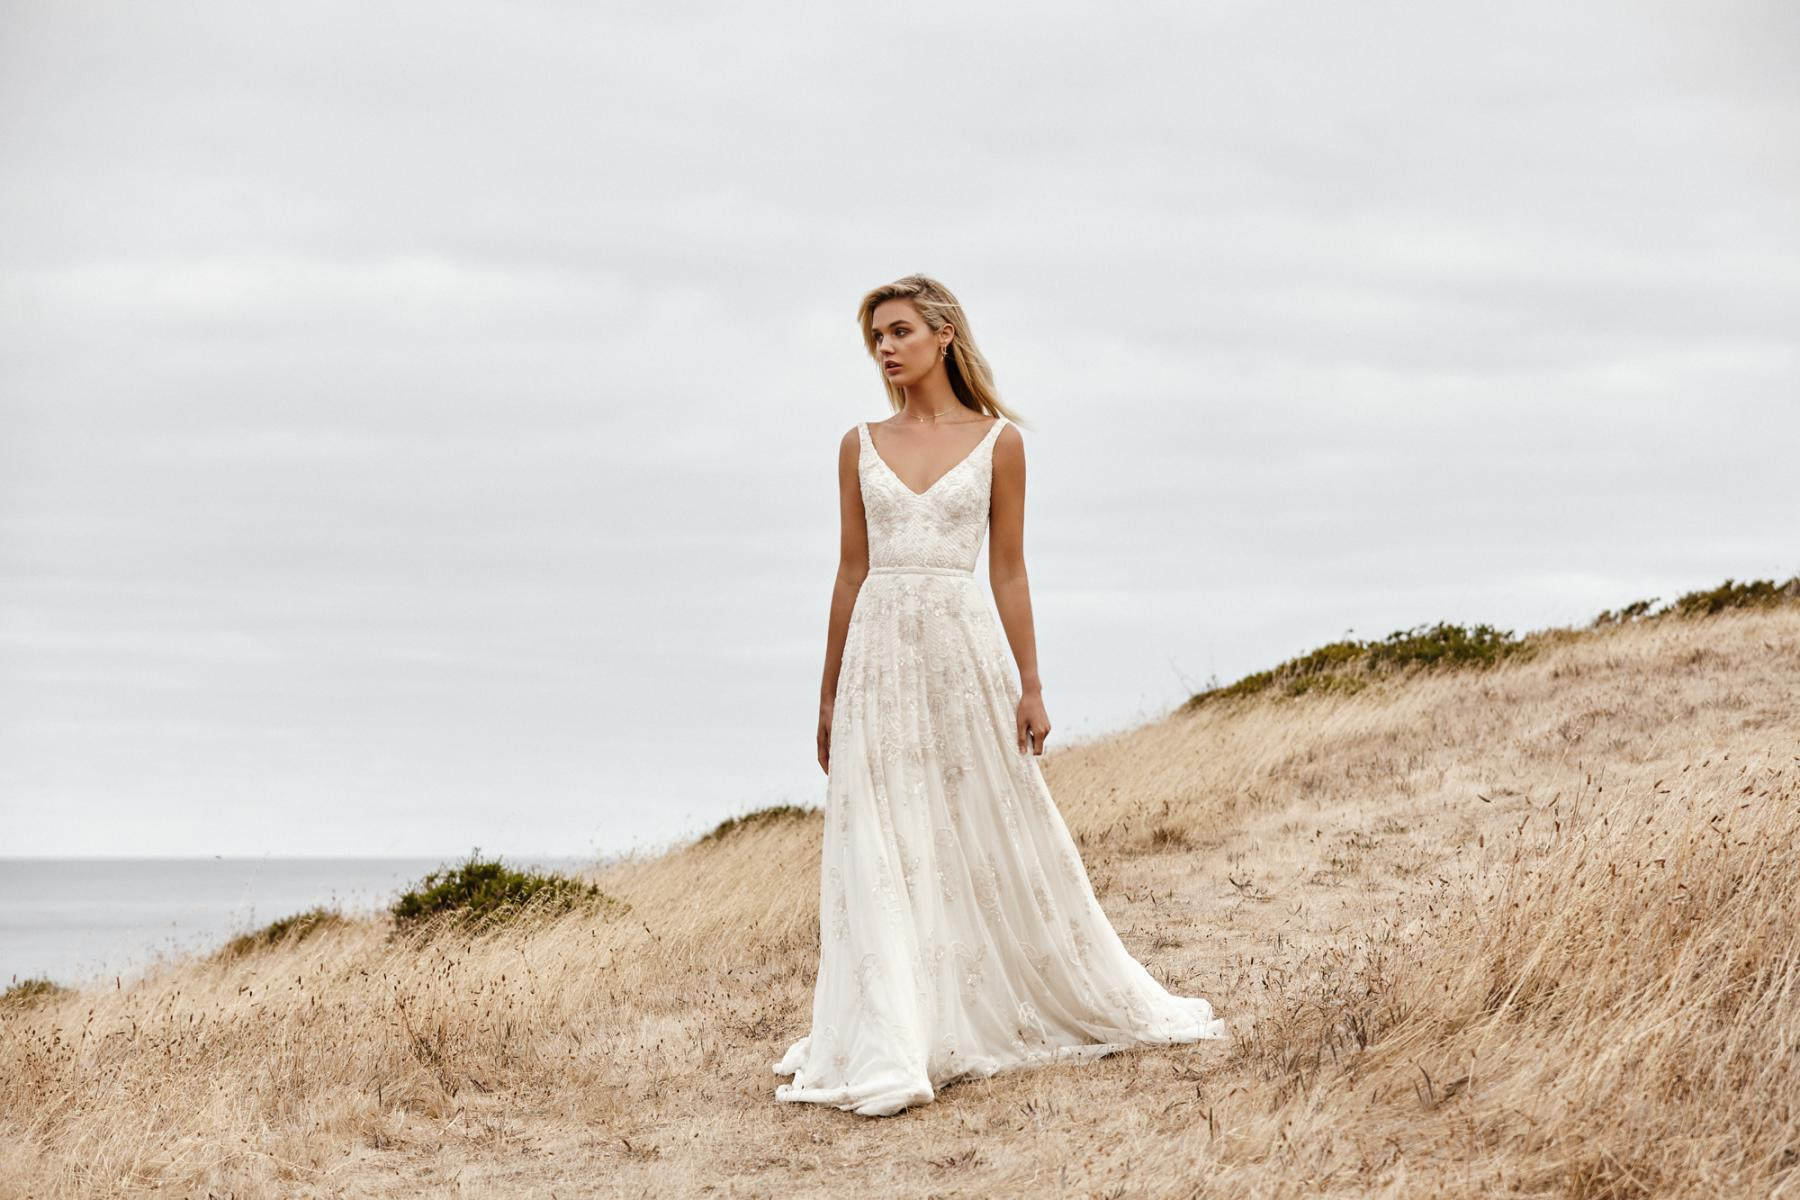 KAREN WILLIS HOLMES on the LOVE FIND CO. Bridal Directory